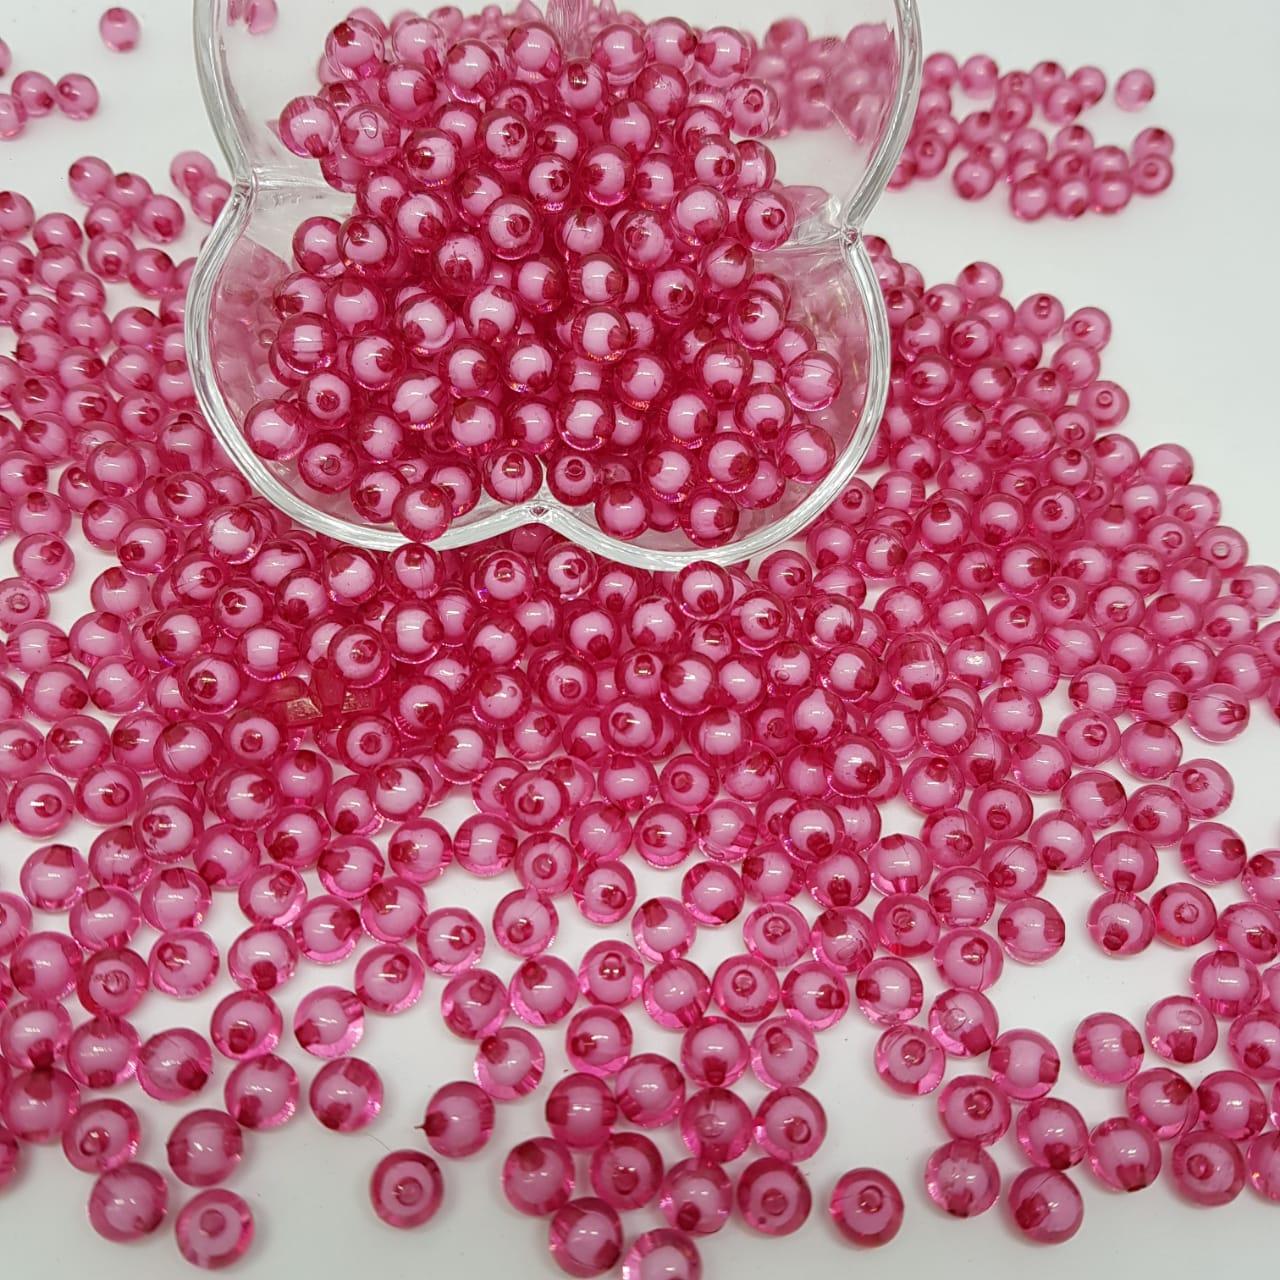 Bolinha de acrilico rosa forte c/ miolo branco lisa  10MM 25g